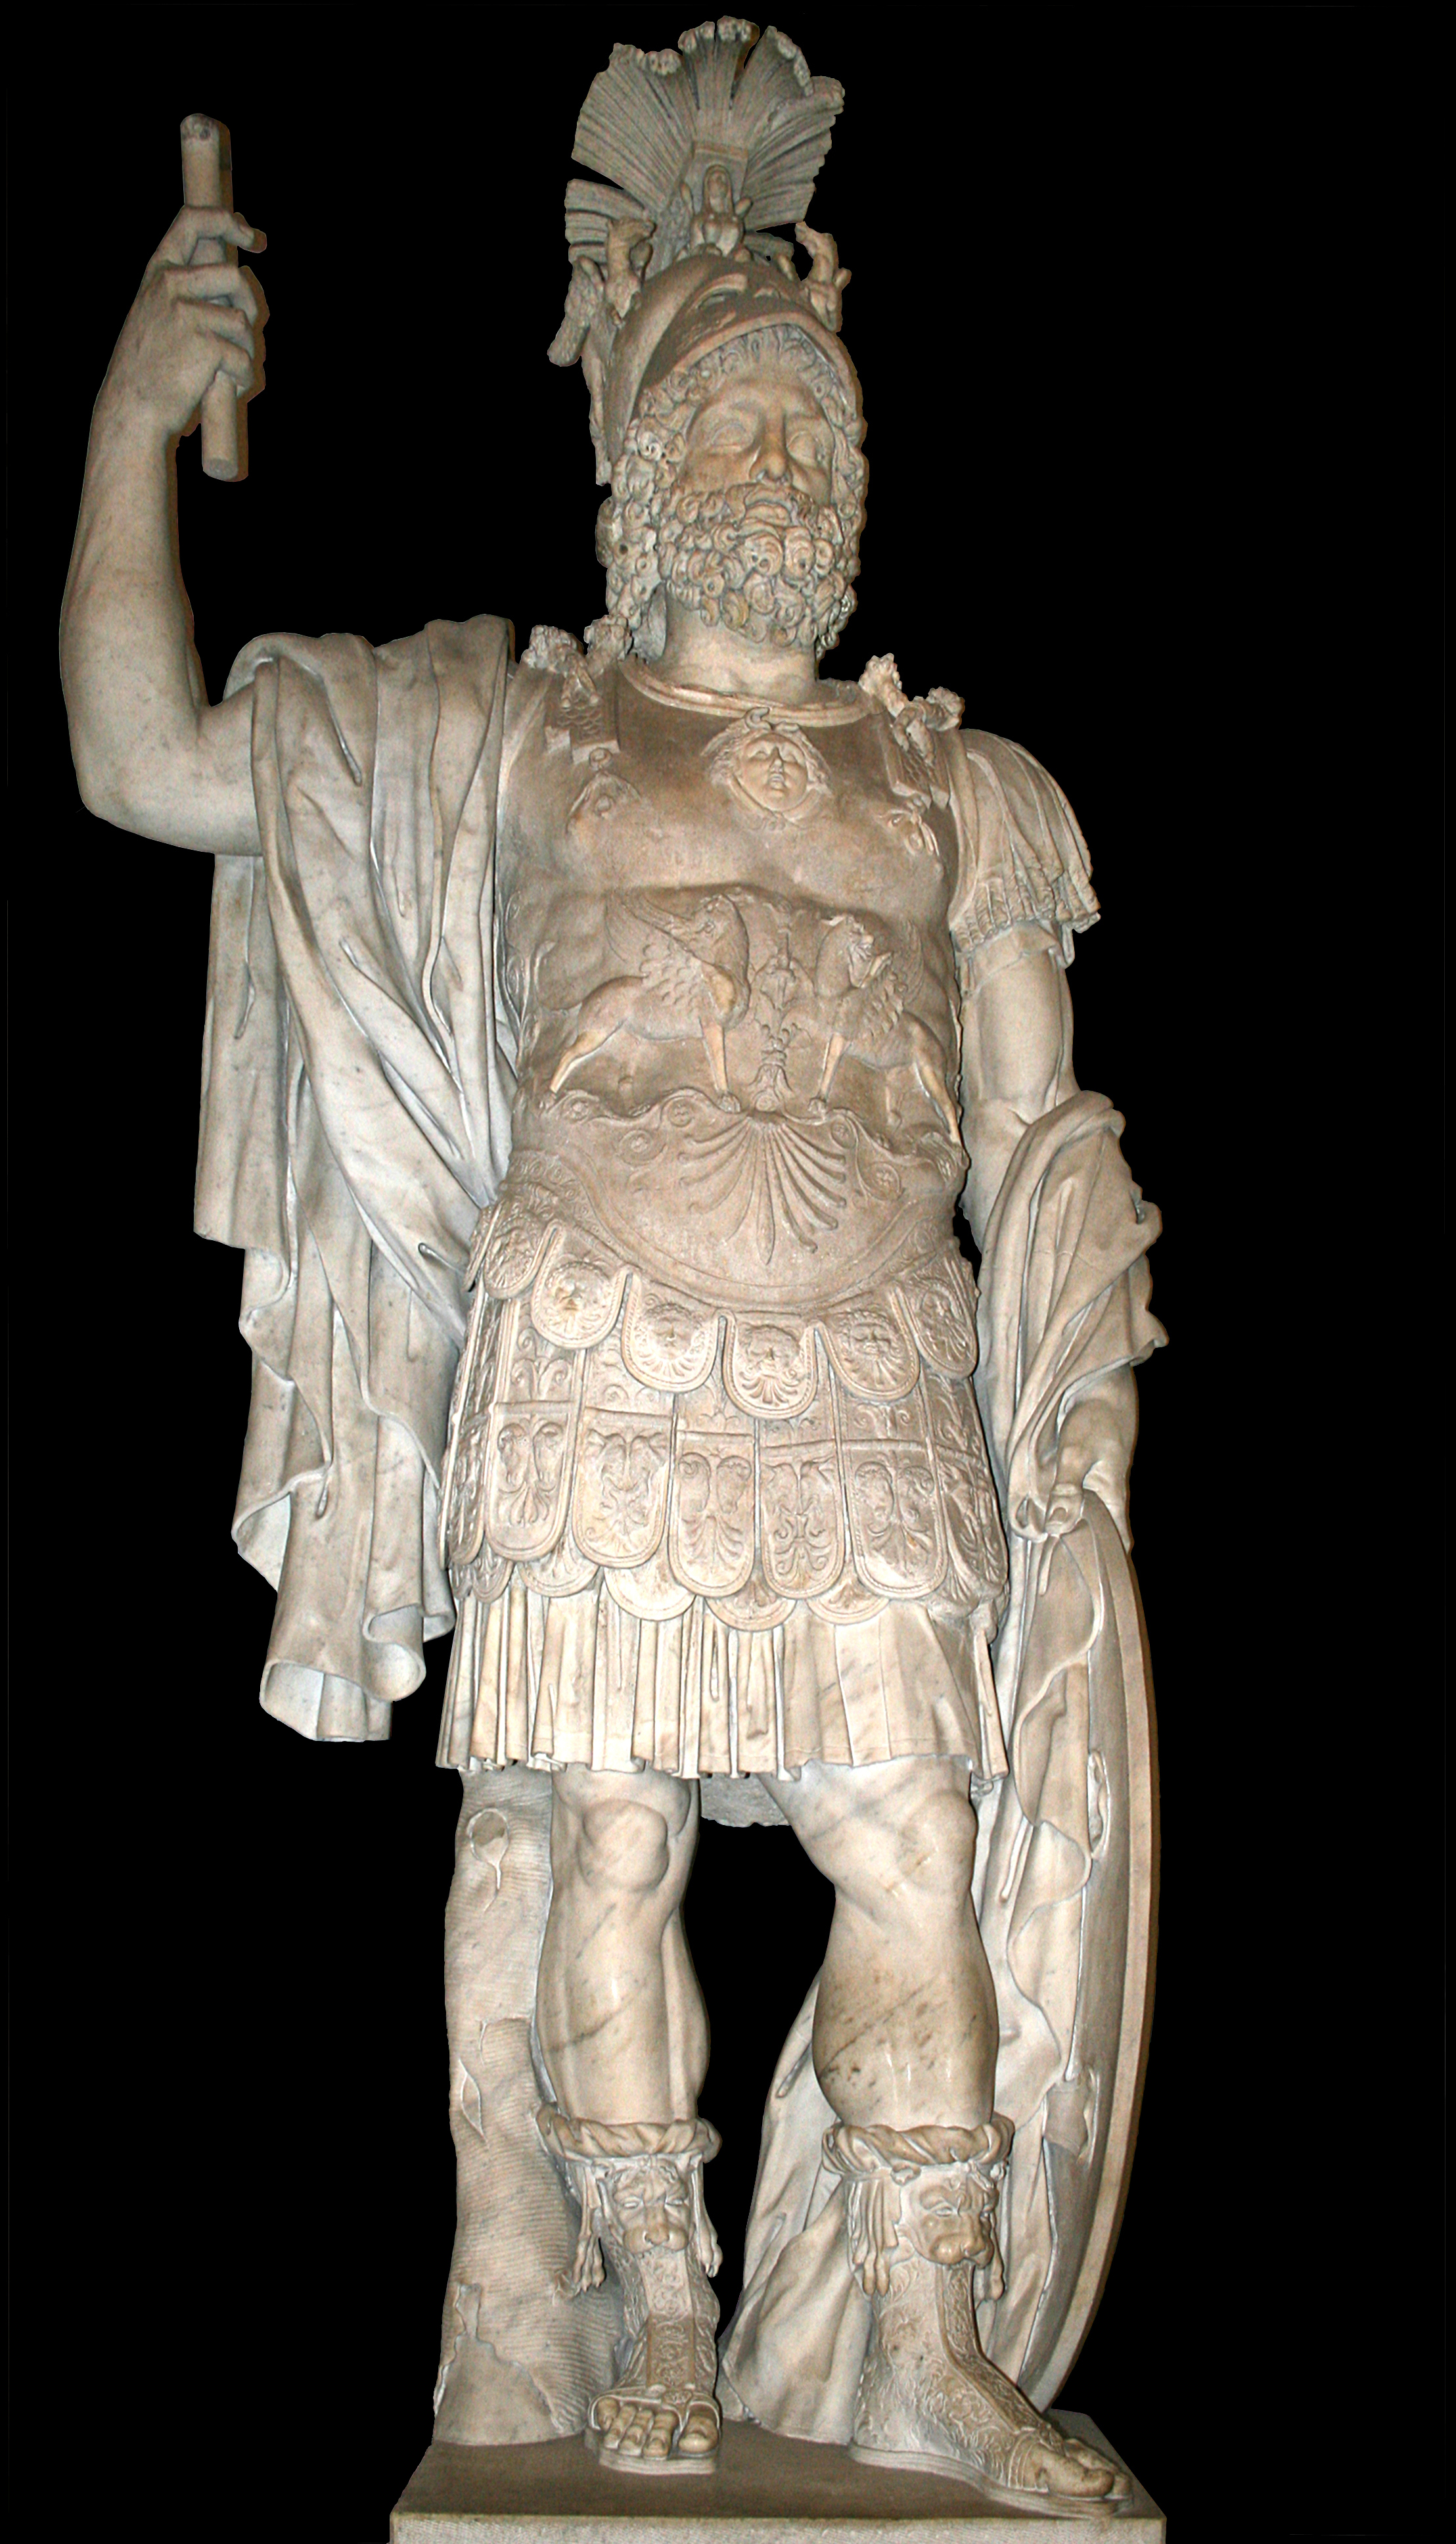 http://upload.wikimedia.org/wikipedia/commons/9/97/0_Statue_de_Mars_%28Pyrrhus%29_-_Musei_Capitolini_-_MC0058_%282%29.JPG